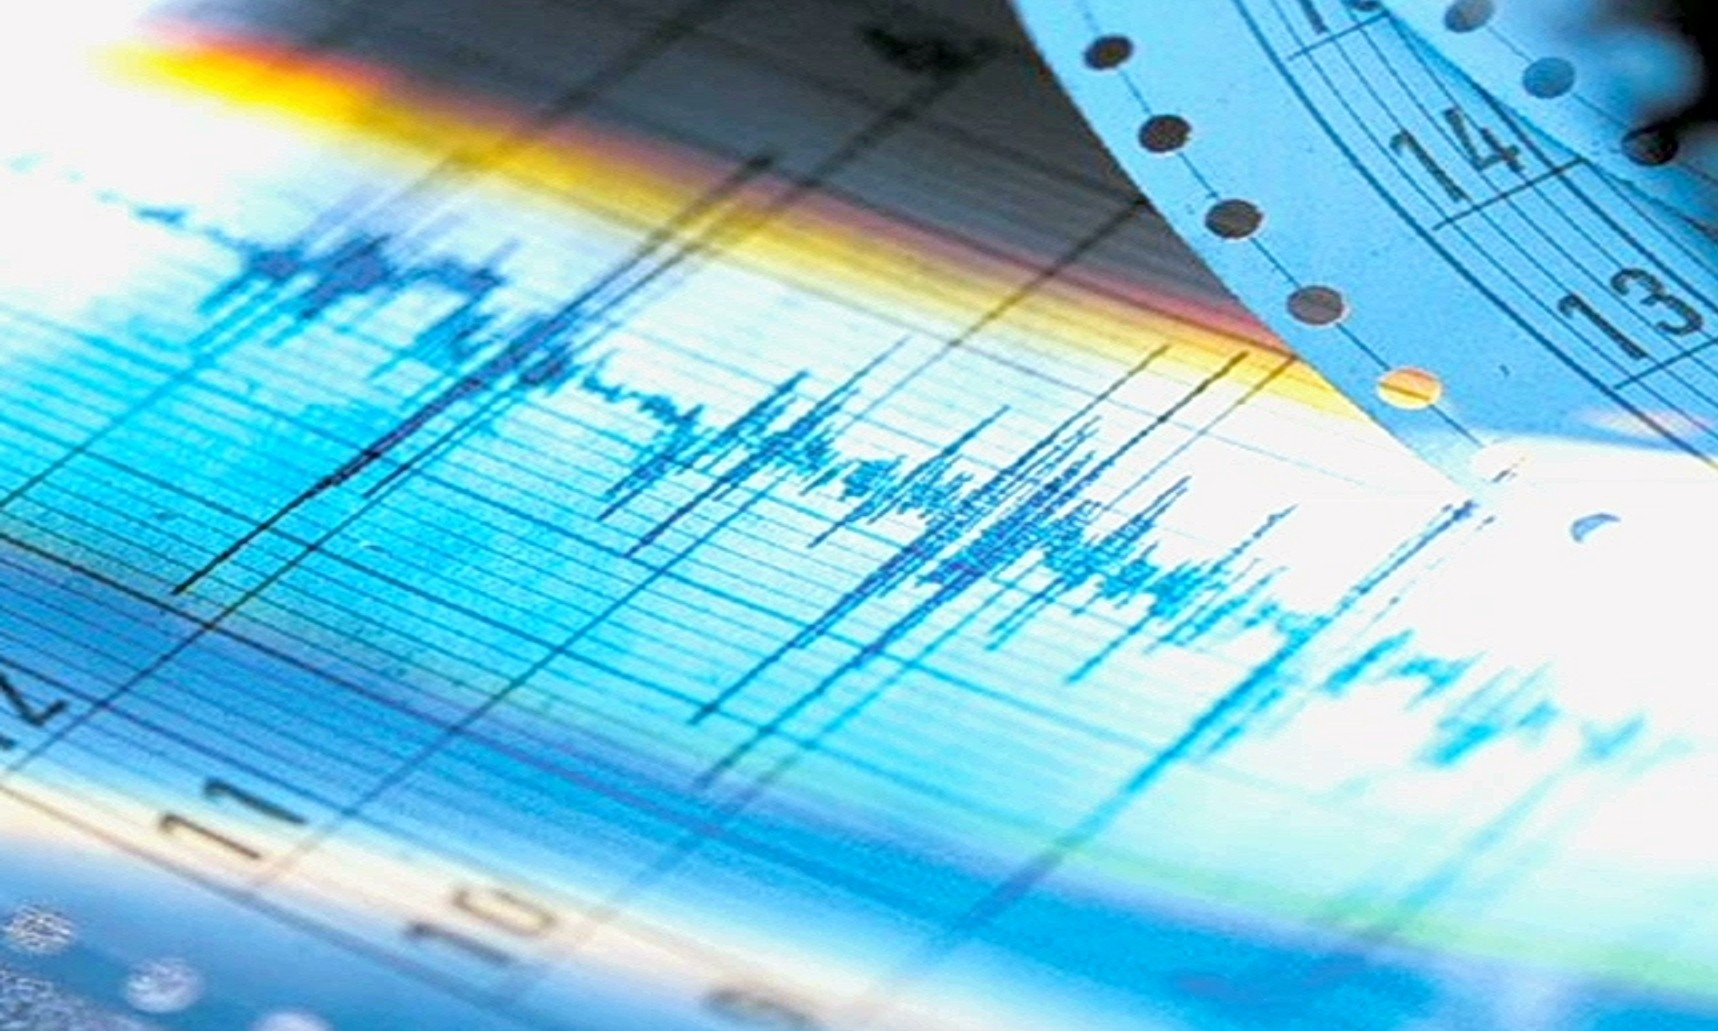 Сразу три землетрясения произошли накануне возле Молдовы